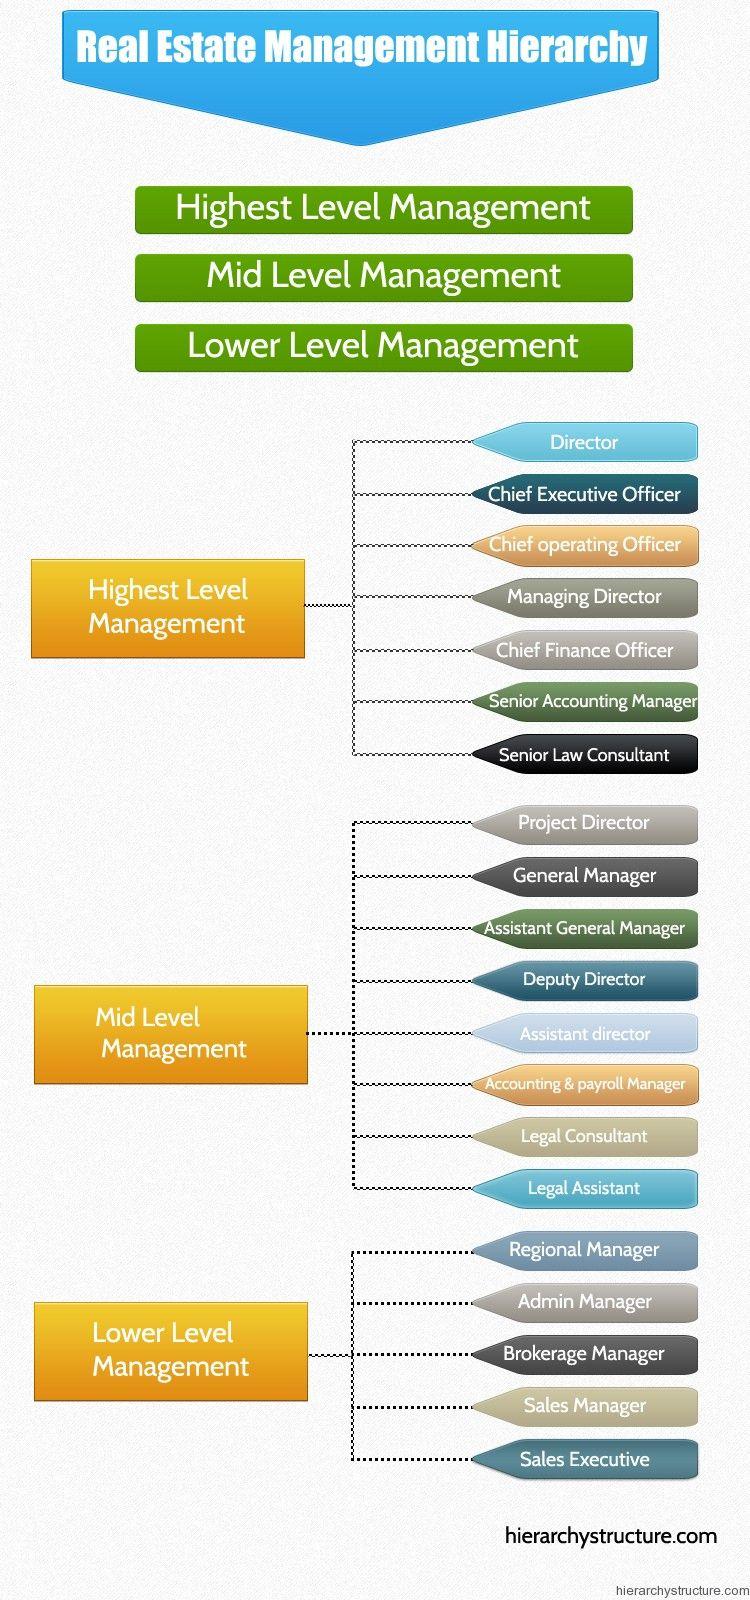 Real Estate Management Hierarchy Estate management, Real